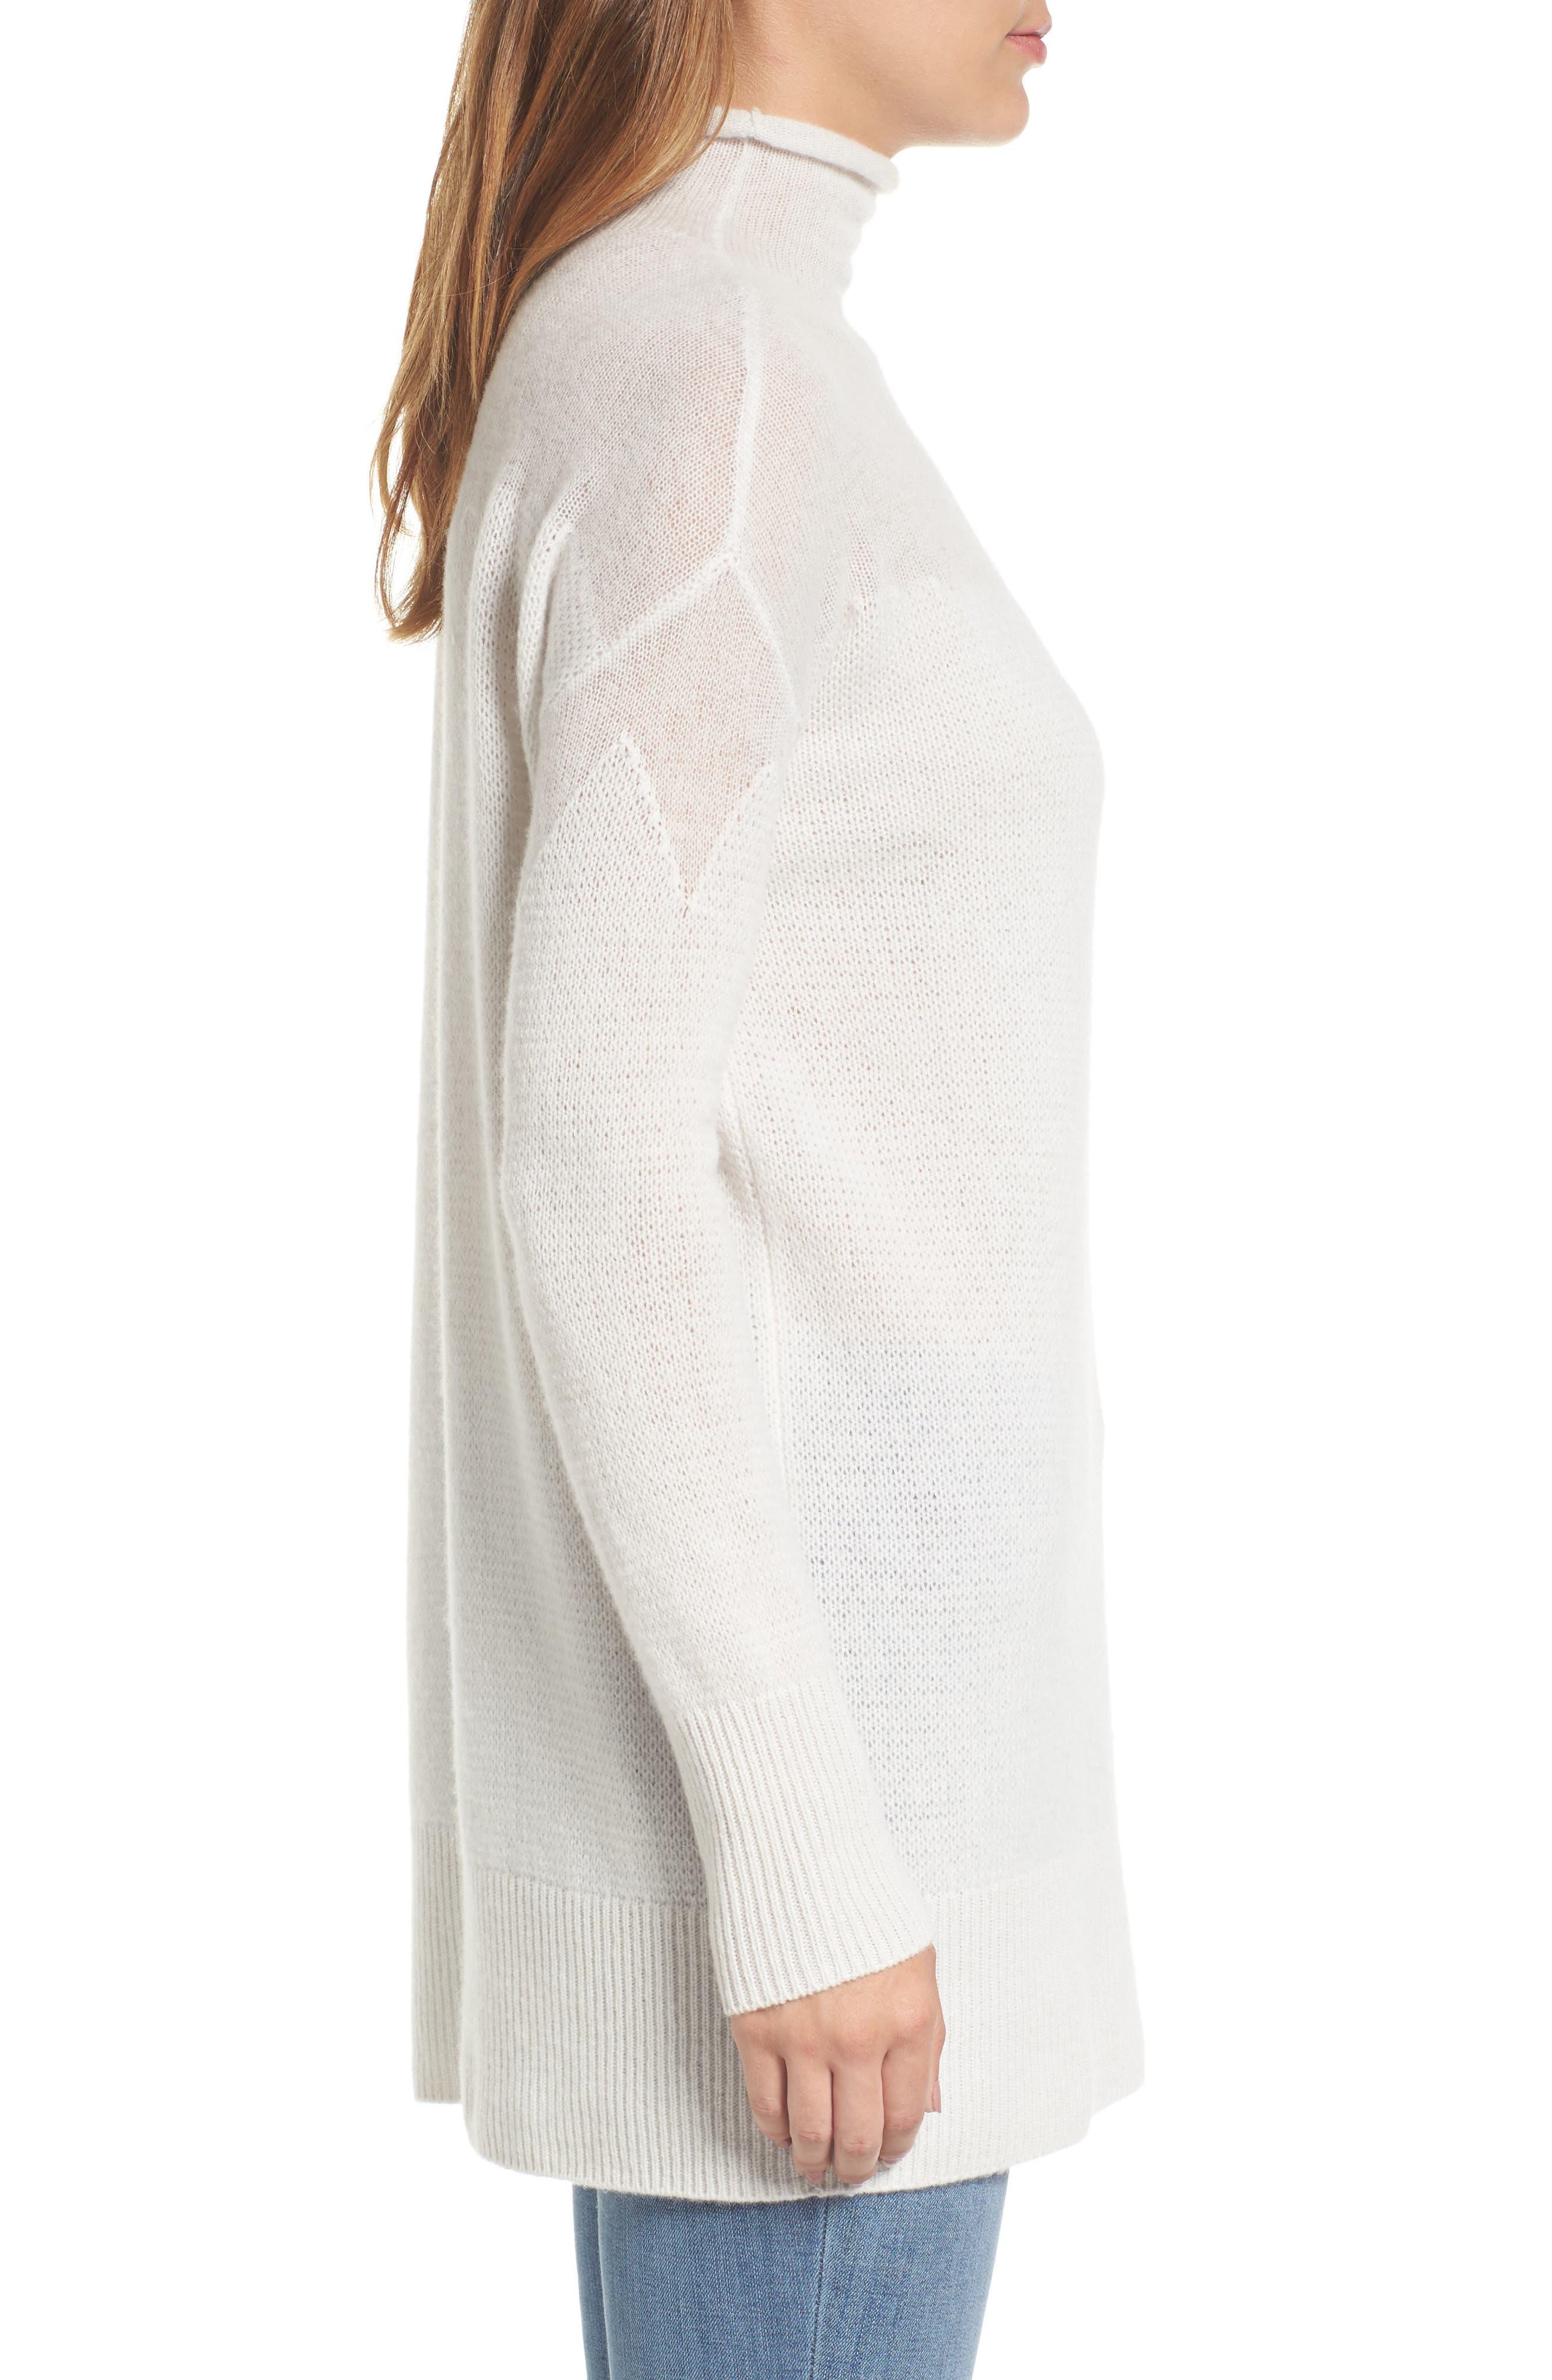 Alternate Image 3  - Halogen® Sheer Yoke Cashmere Sweater (Regular & Petite)